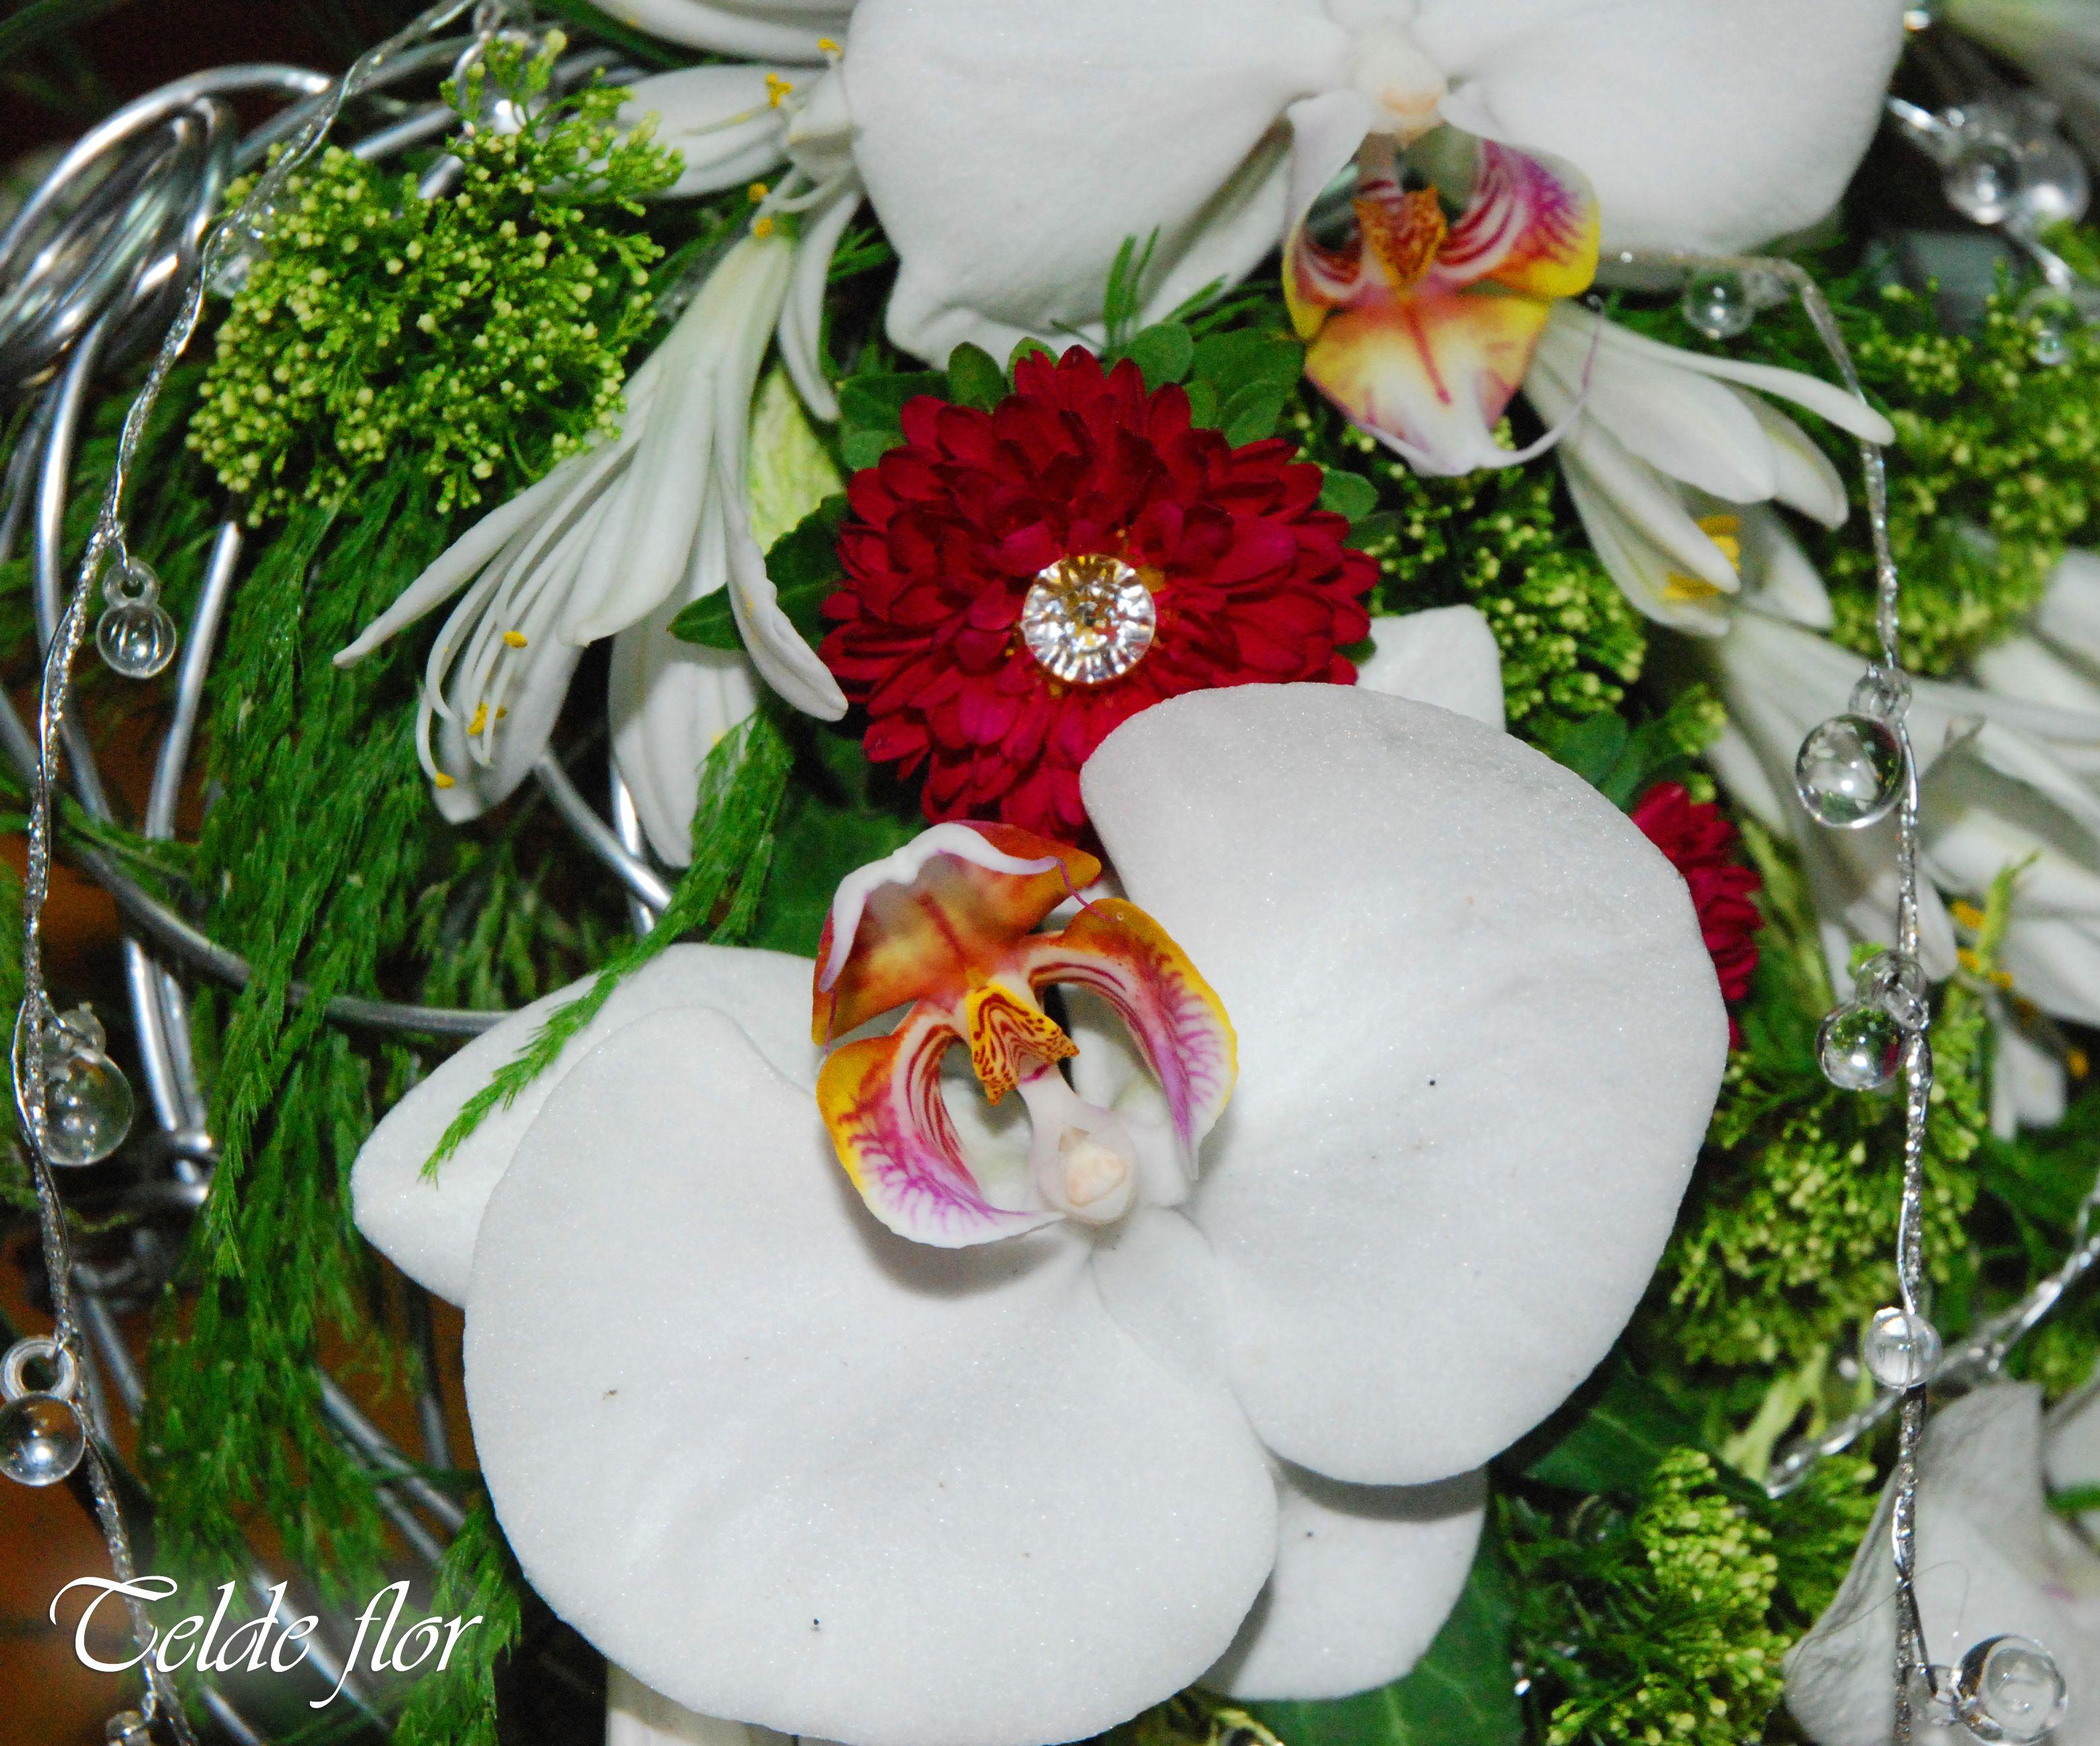 Detalle Ramo de Novia Ramos de Novia floristería Telde flor Bodas Ciudad de Telde